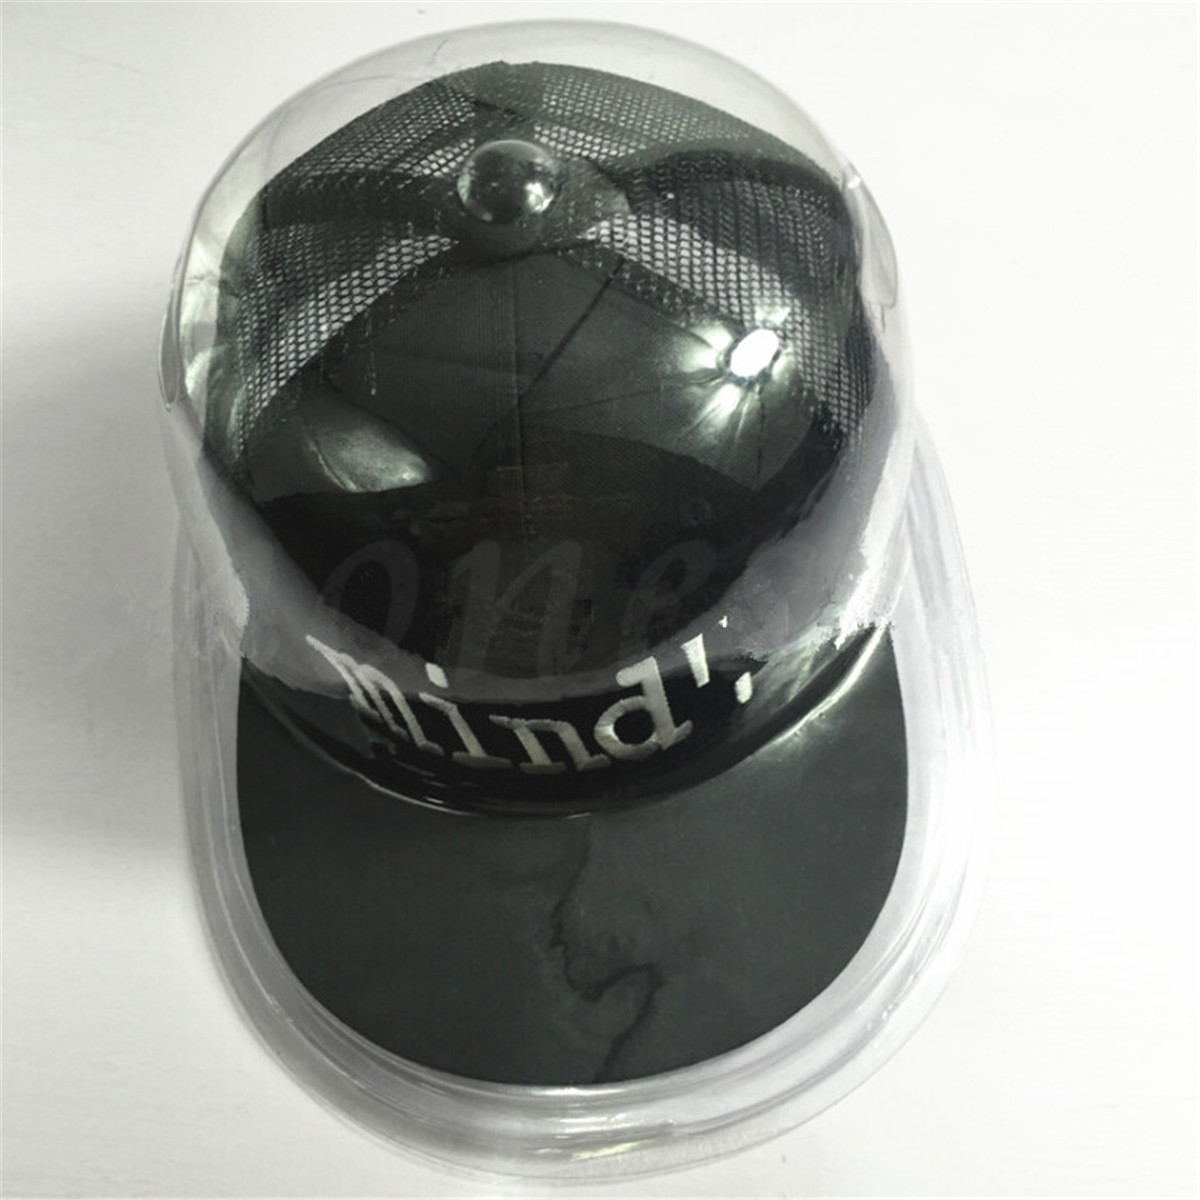 Plastic Clear Baseball Football Cap Dustproof Hat Display Case Holder  Protector